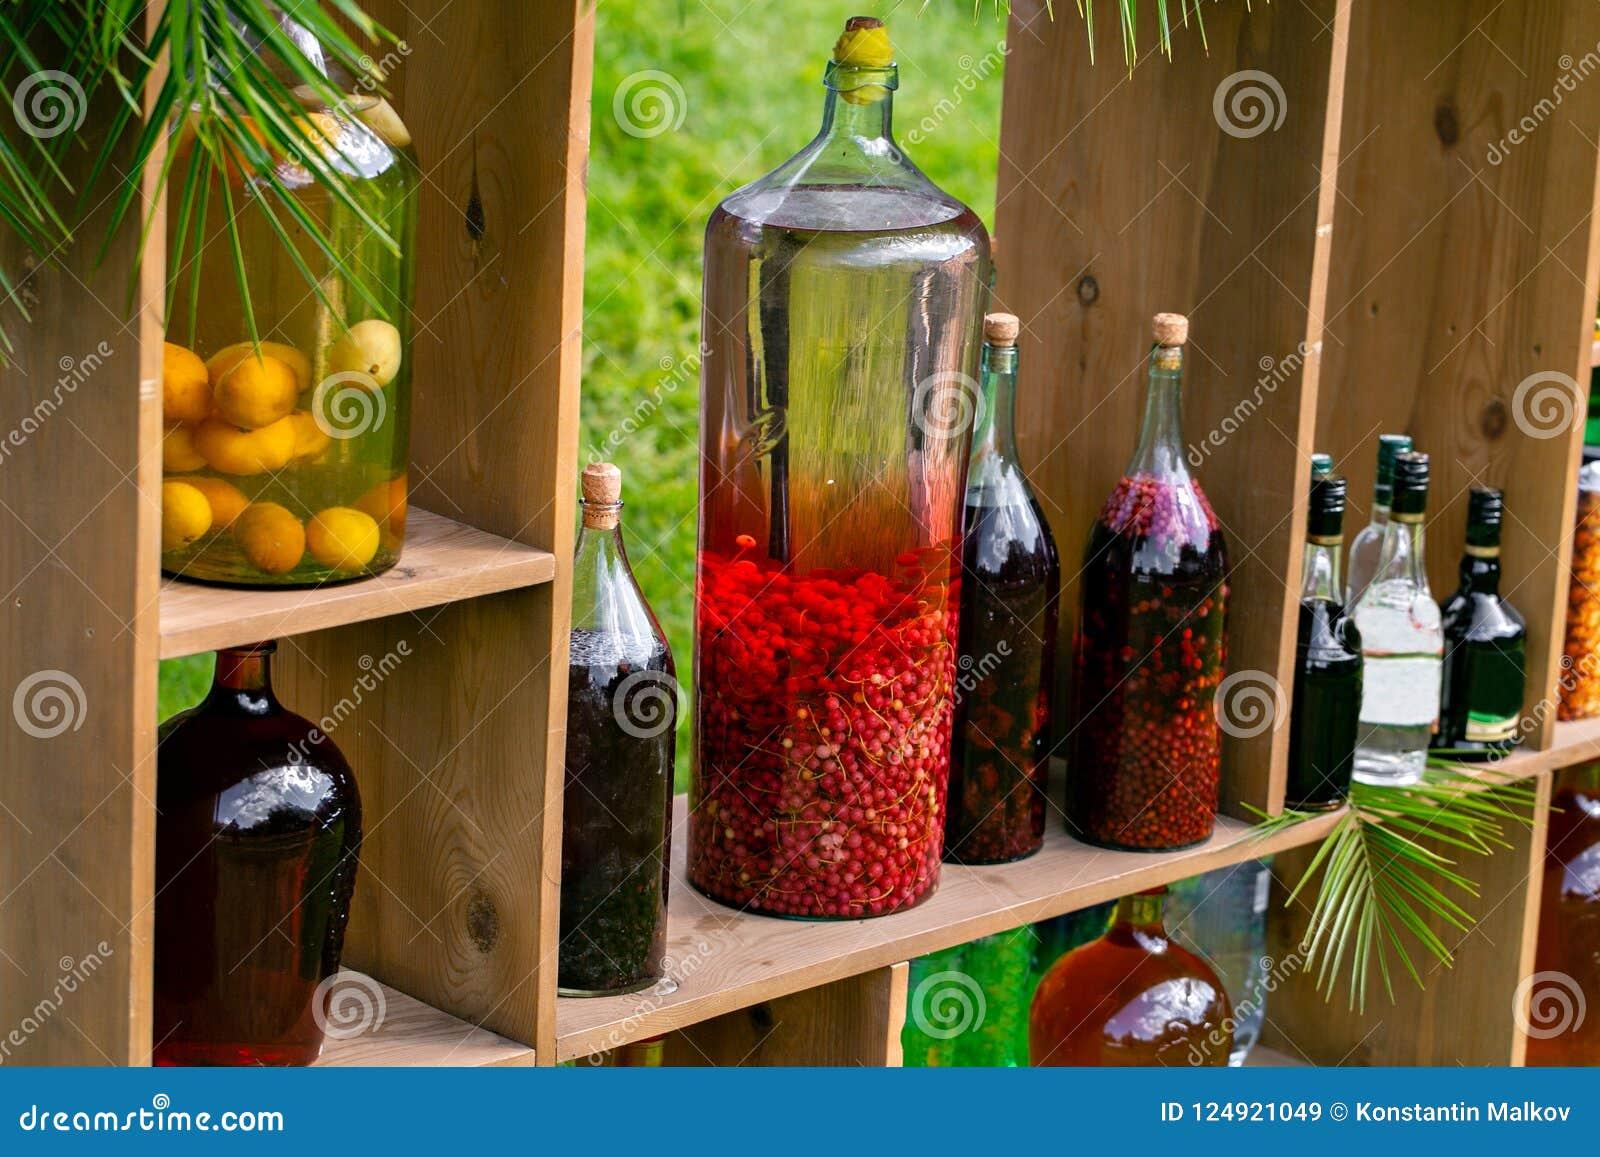 Tincture bottles of lemon, currant, berries and rowanberries. Herbal medicine. Spirits, wine and liqueur